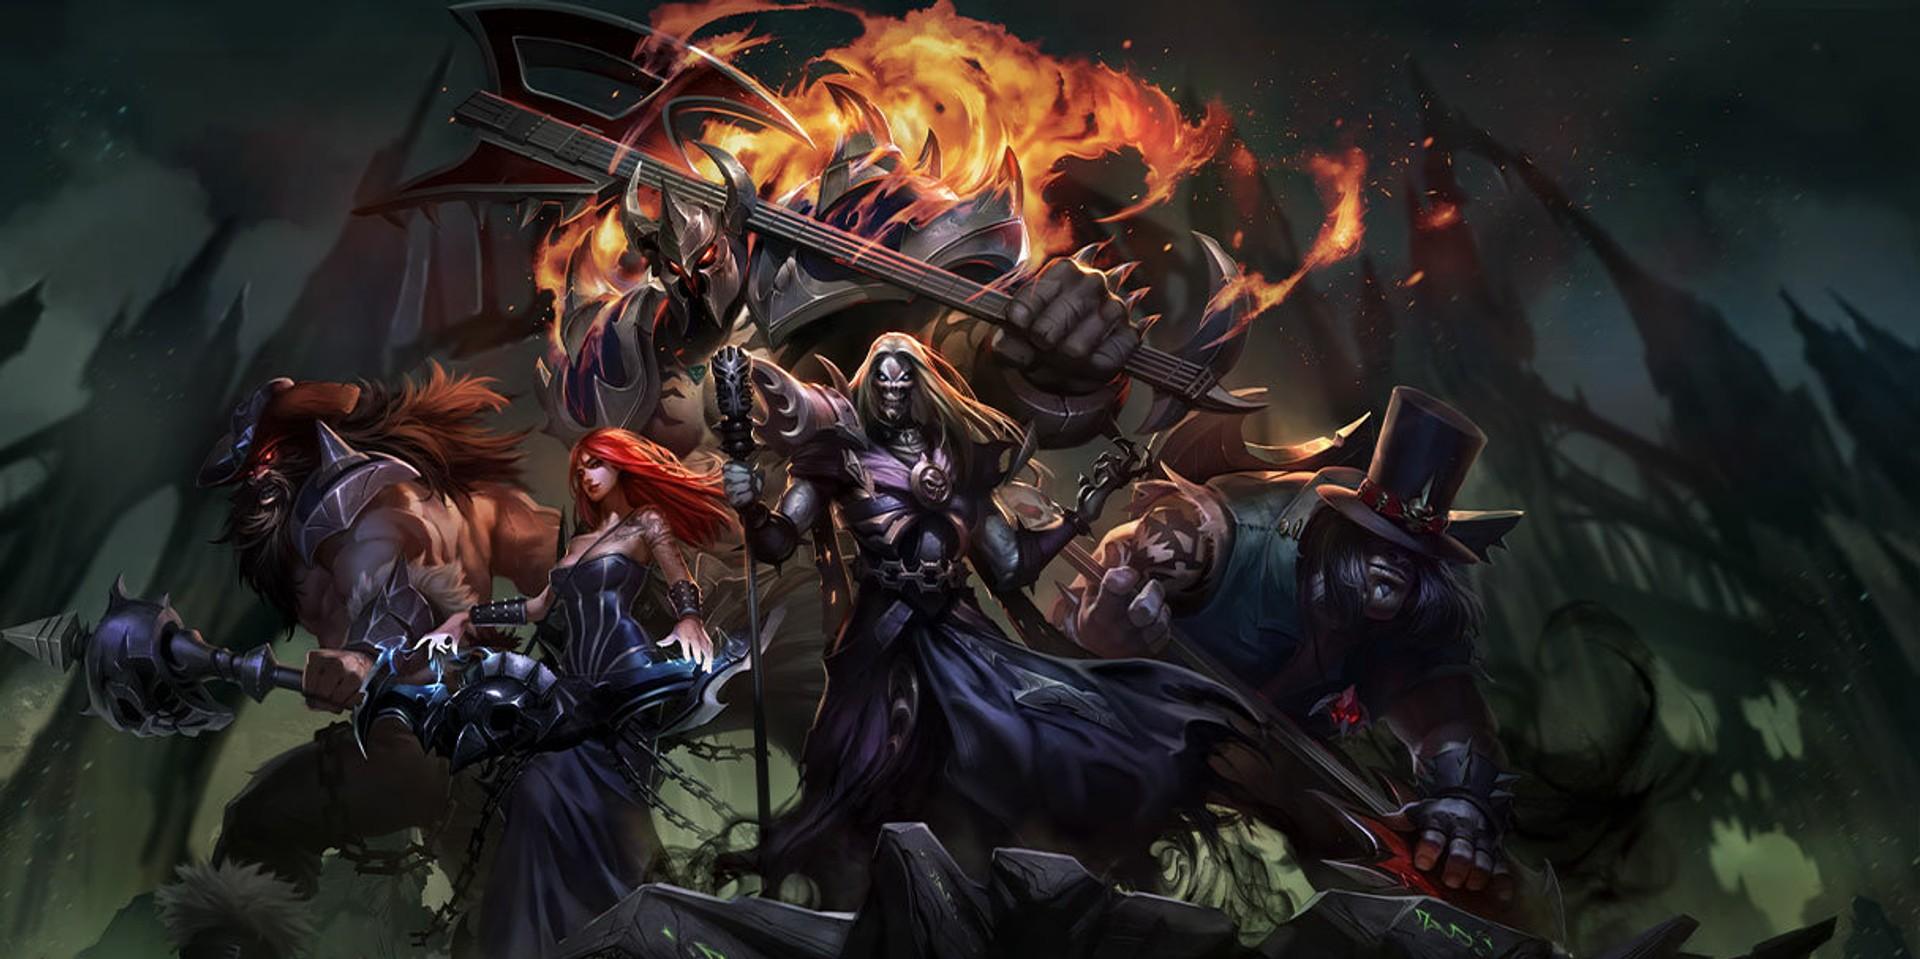 Virtual metal band PENTAKILL to hold comeback performance at League of Legends' 2021 Mid-Season Showcase